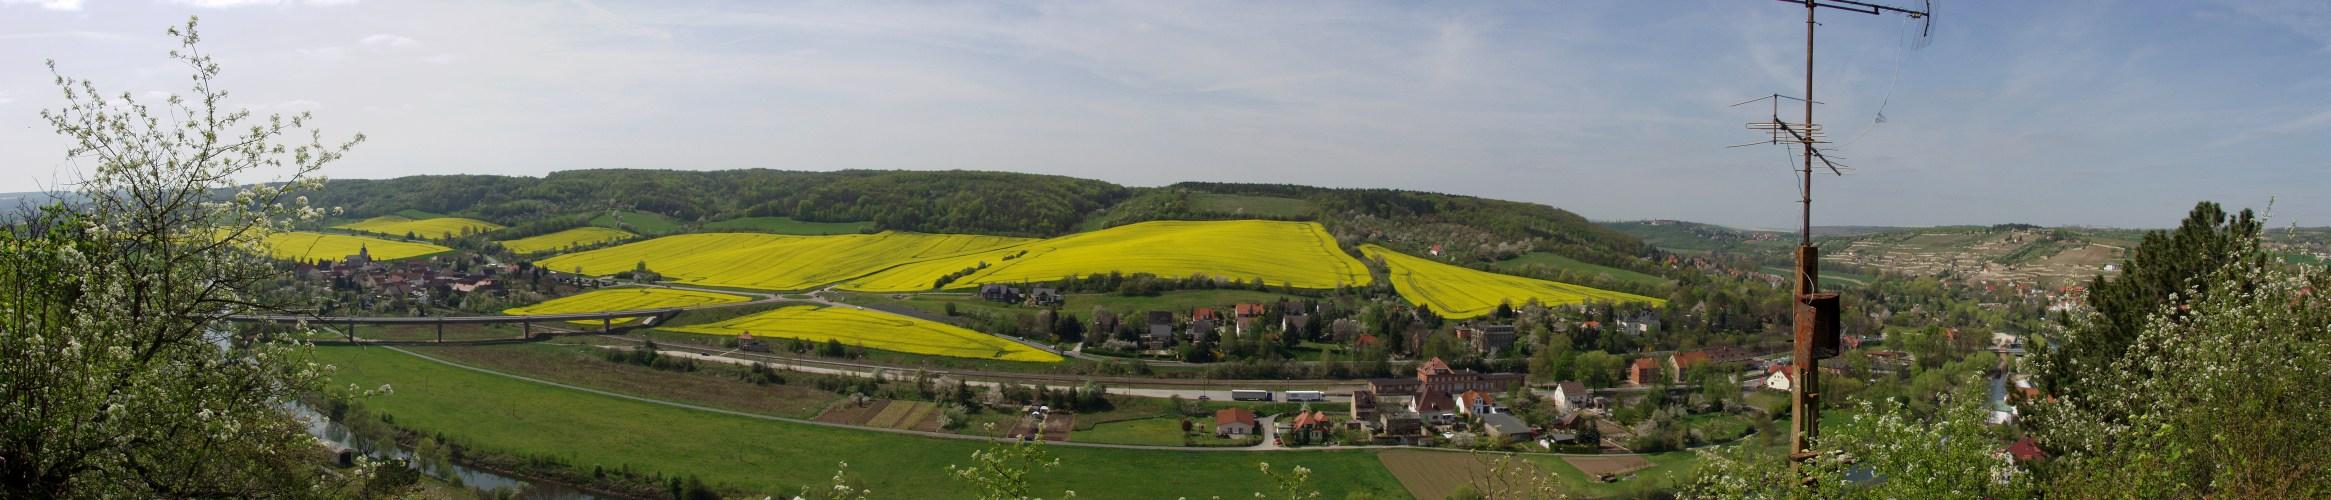 Freyberger Raps Landschaft